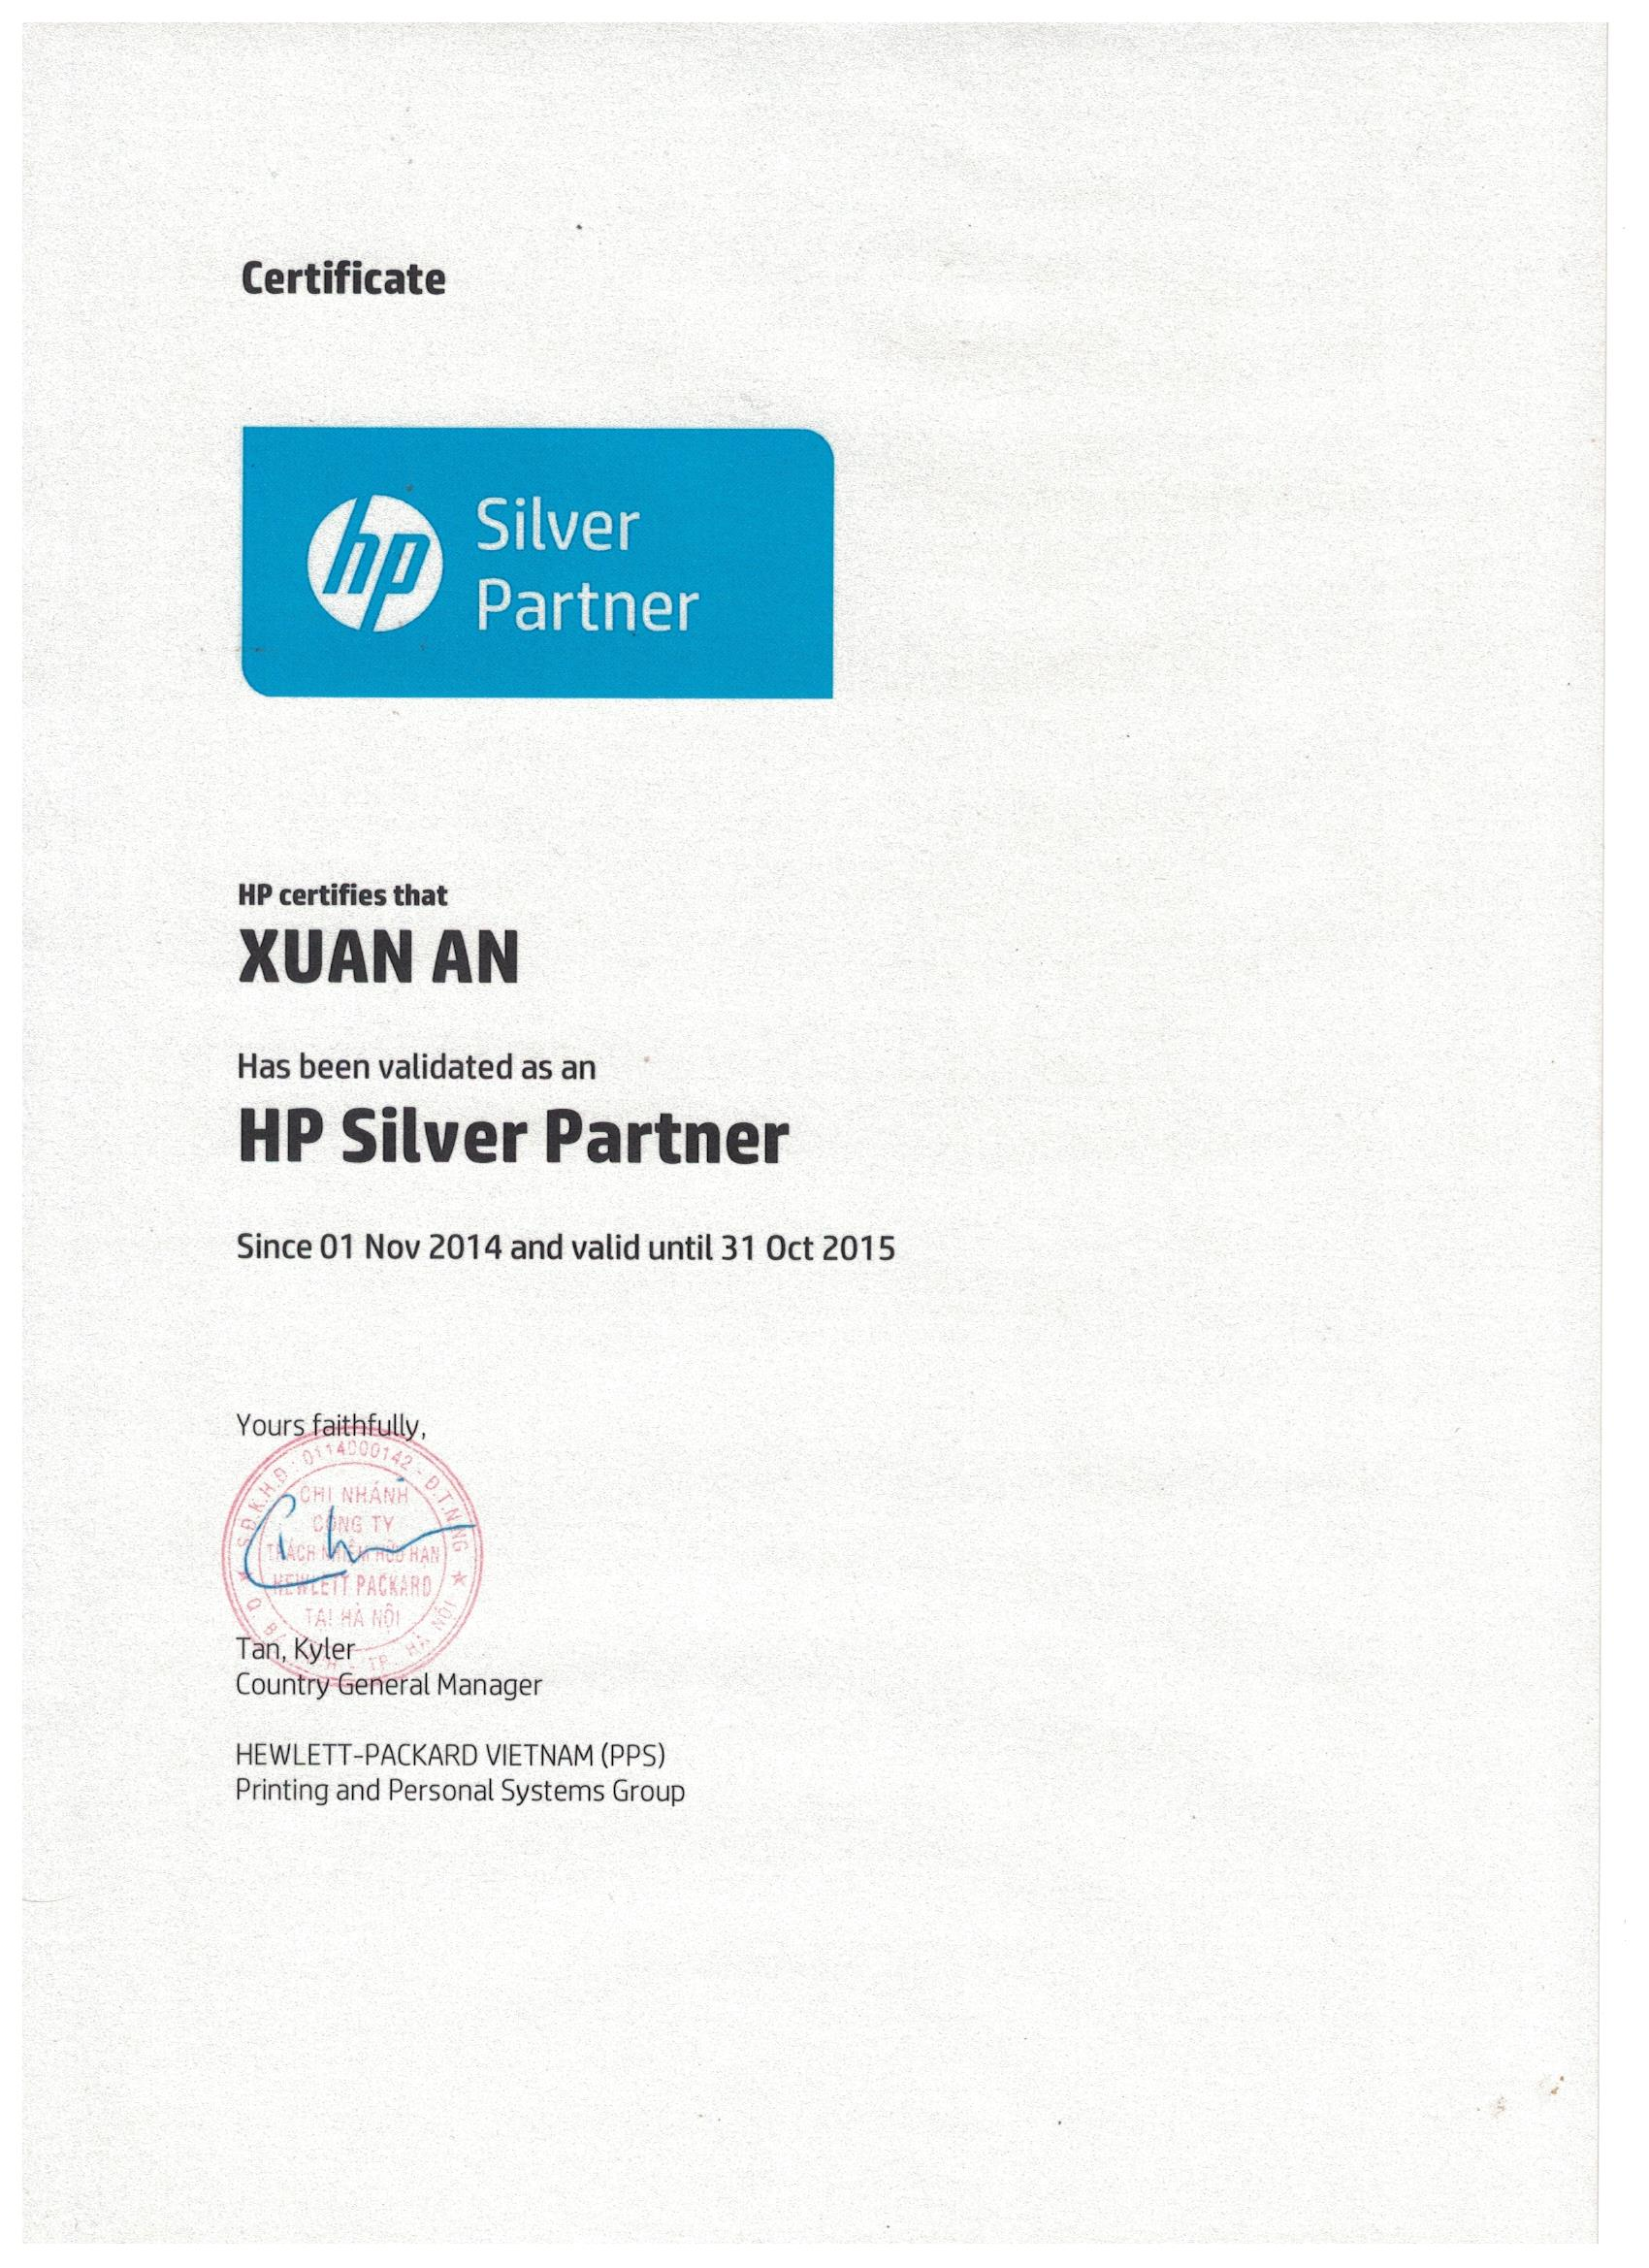 HP Probook 430 G7 - 9GQ06PA (Silver)